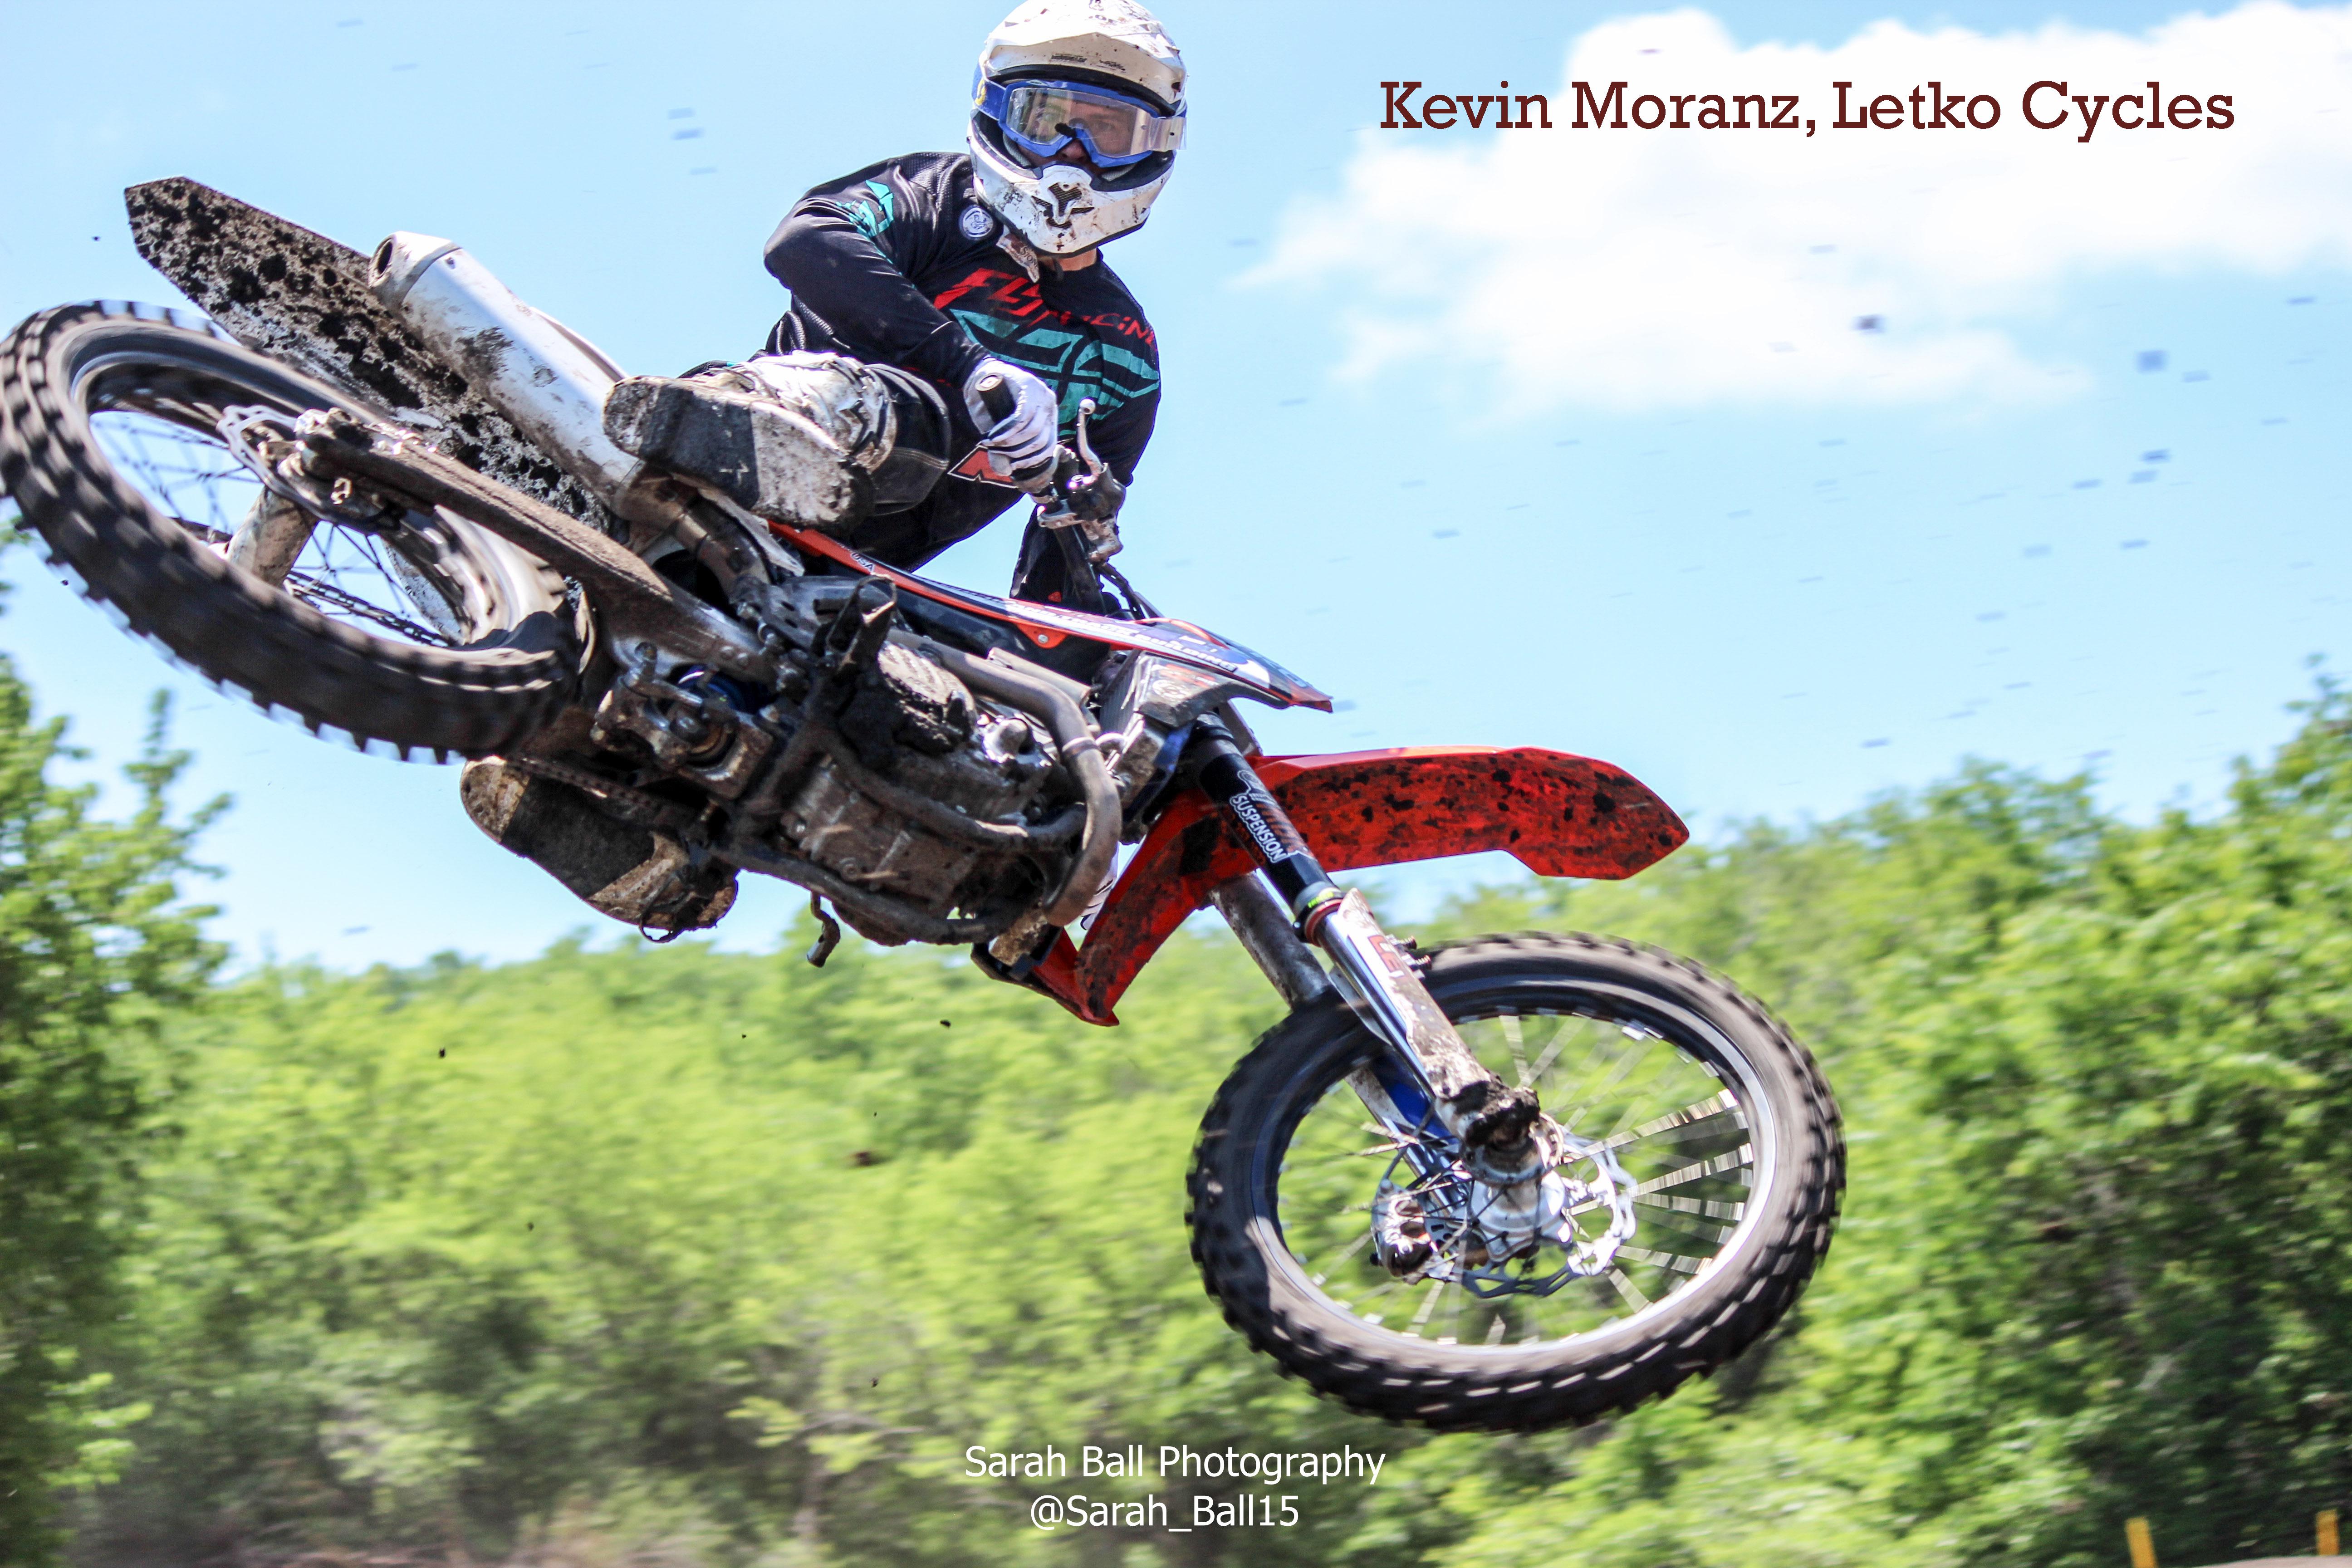 Kevin Moranz